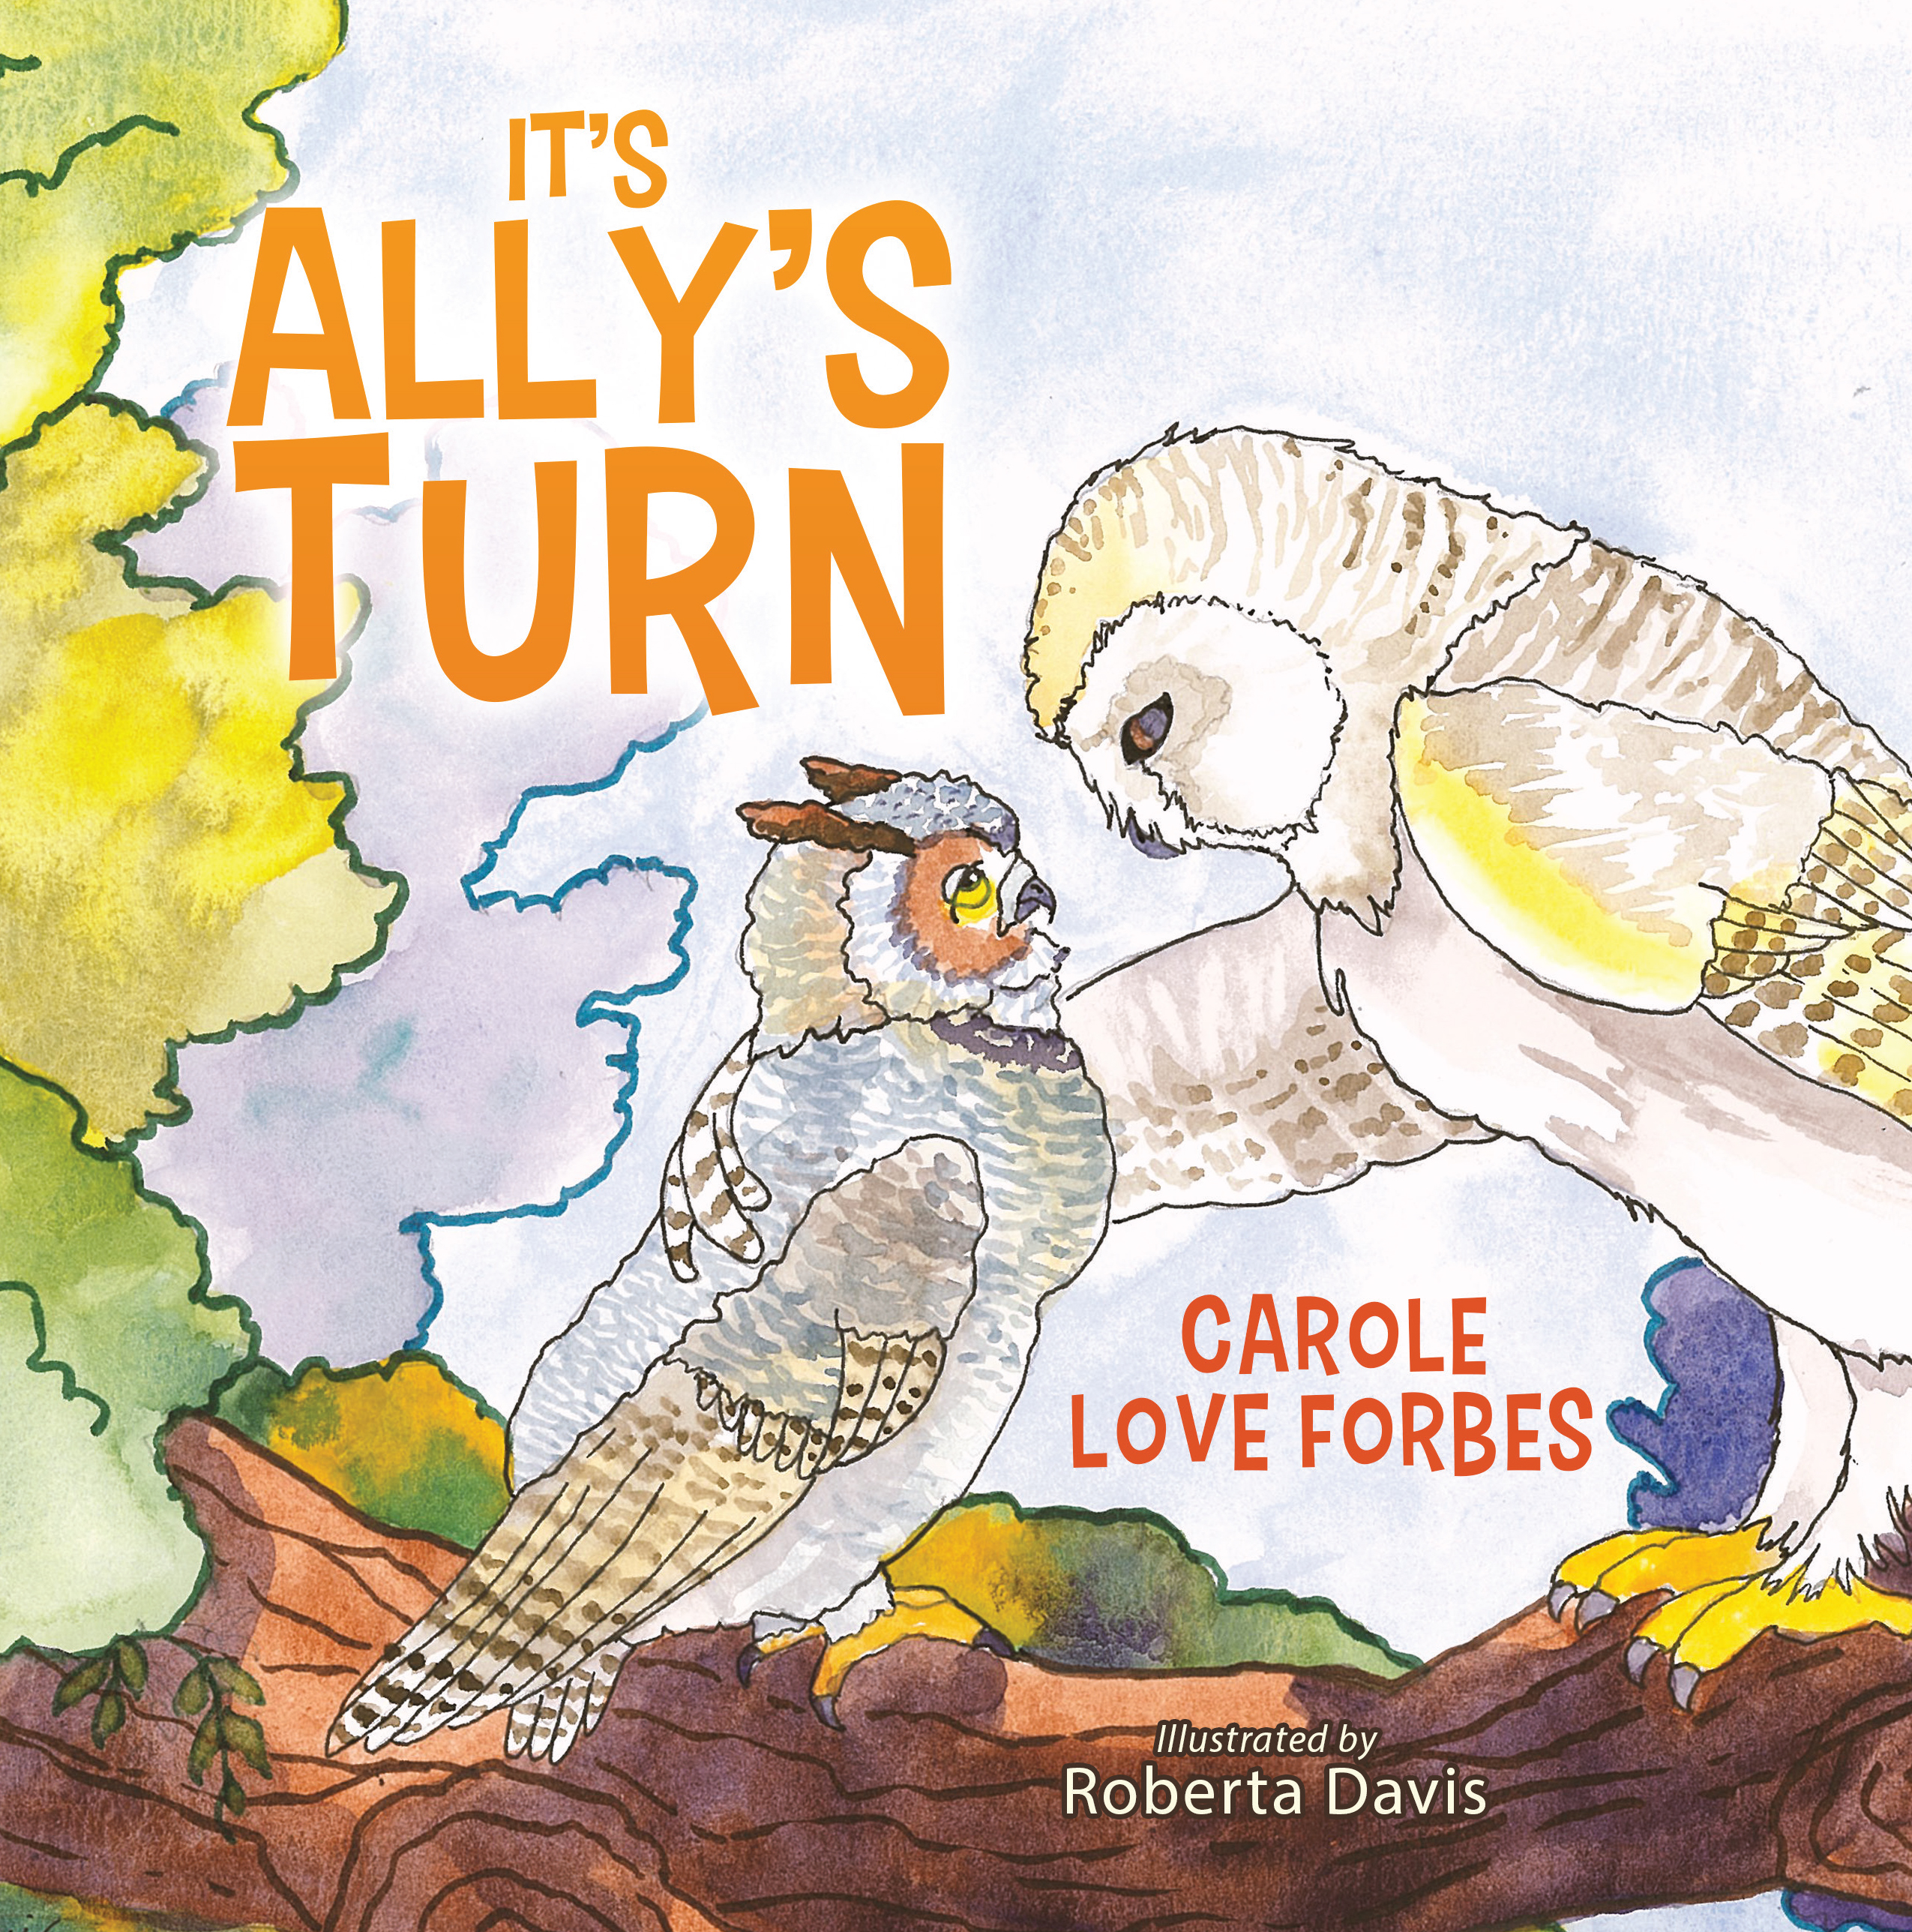 Self-esteem charming book for children flies high on bookshelves